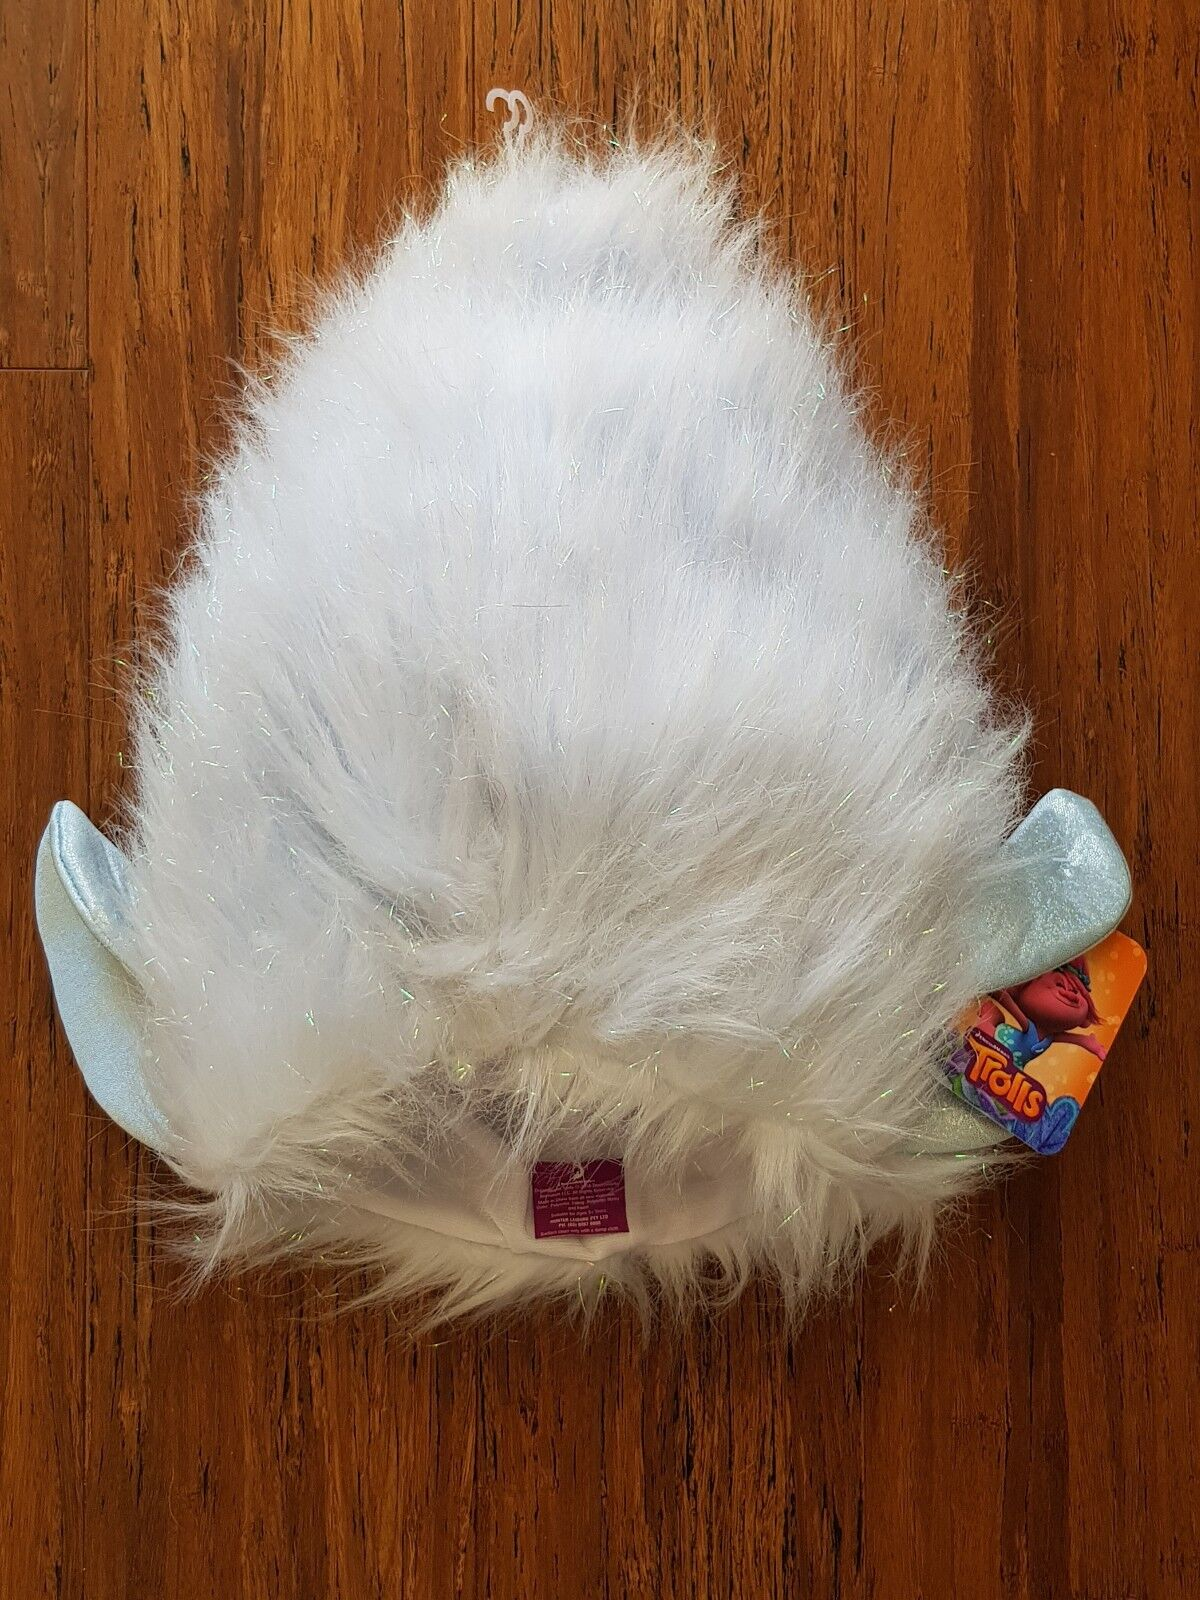 Trolls Guy Diamond Wig Hat Cap Hair Dress Up Costume Accessory Halloween 22